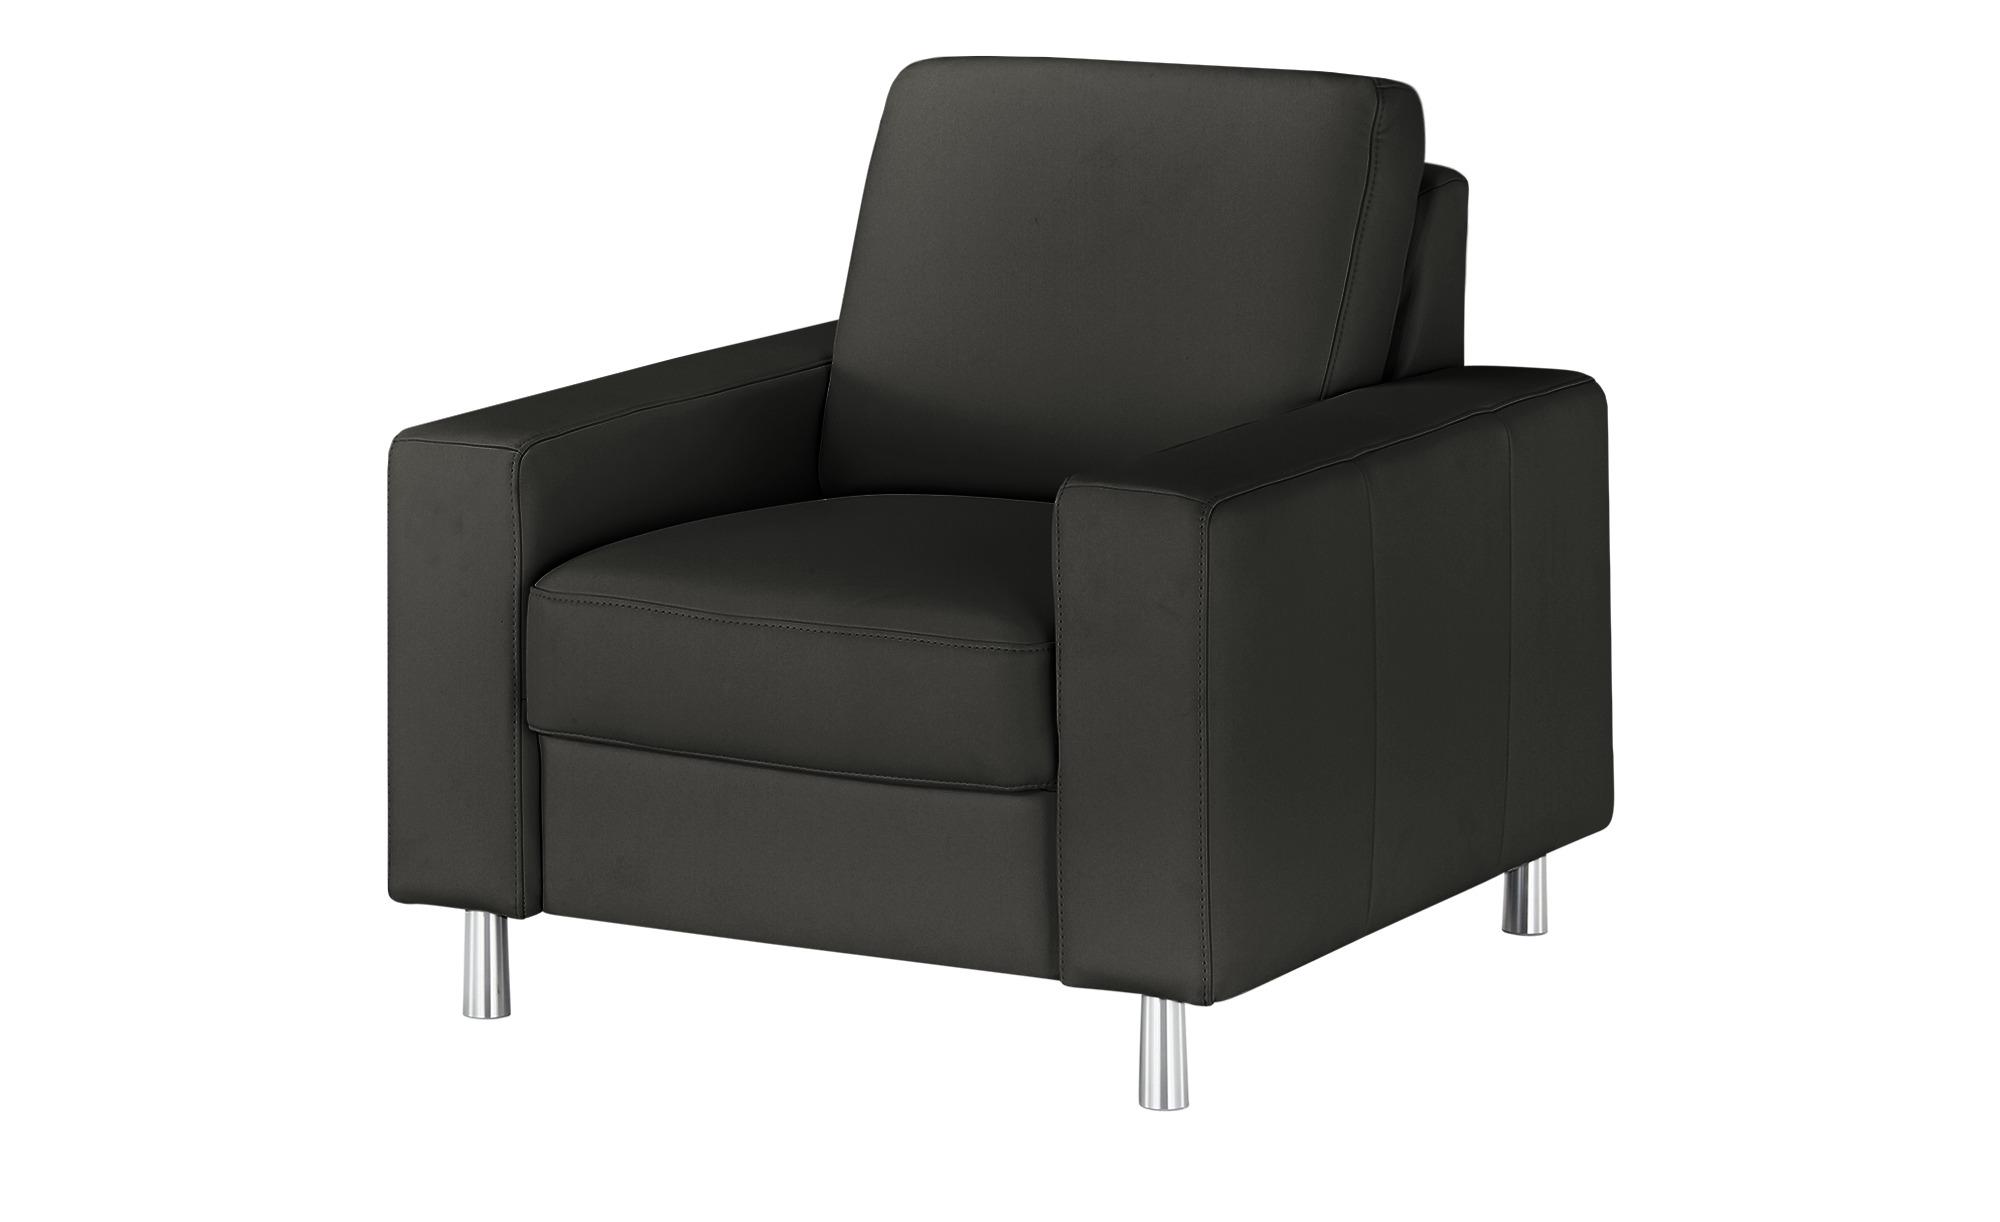 meinSofa Sessel  Byron ¦ schwarz ¦ Maße (cm): B: 88 H: 86 T: 95 Polstermöbel > Sessel > Ledersessel - Höffner